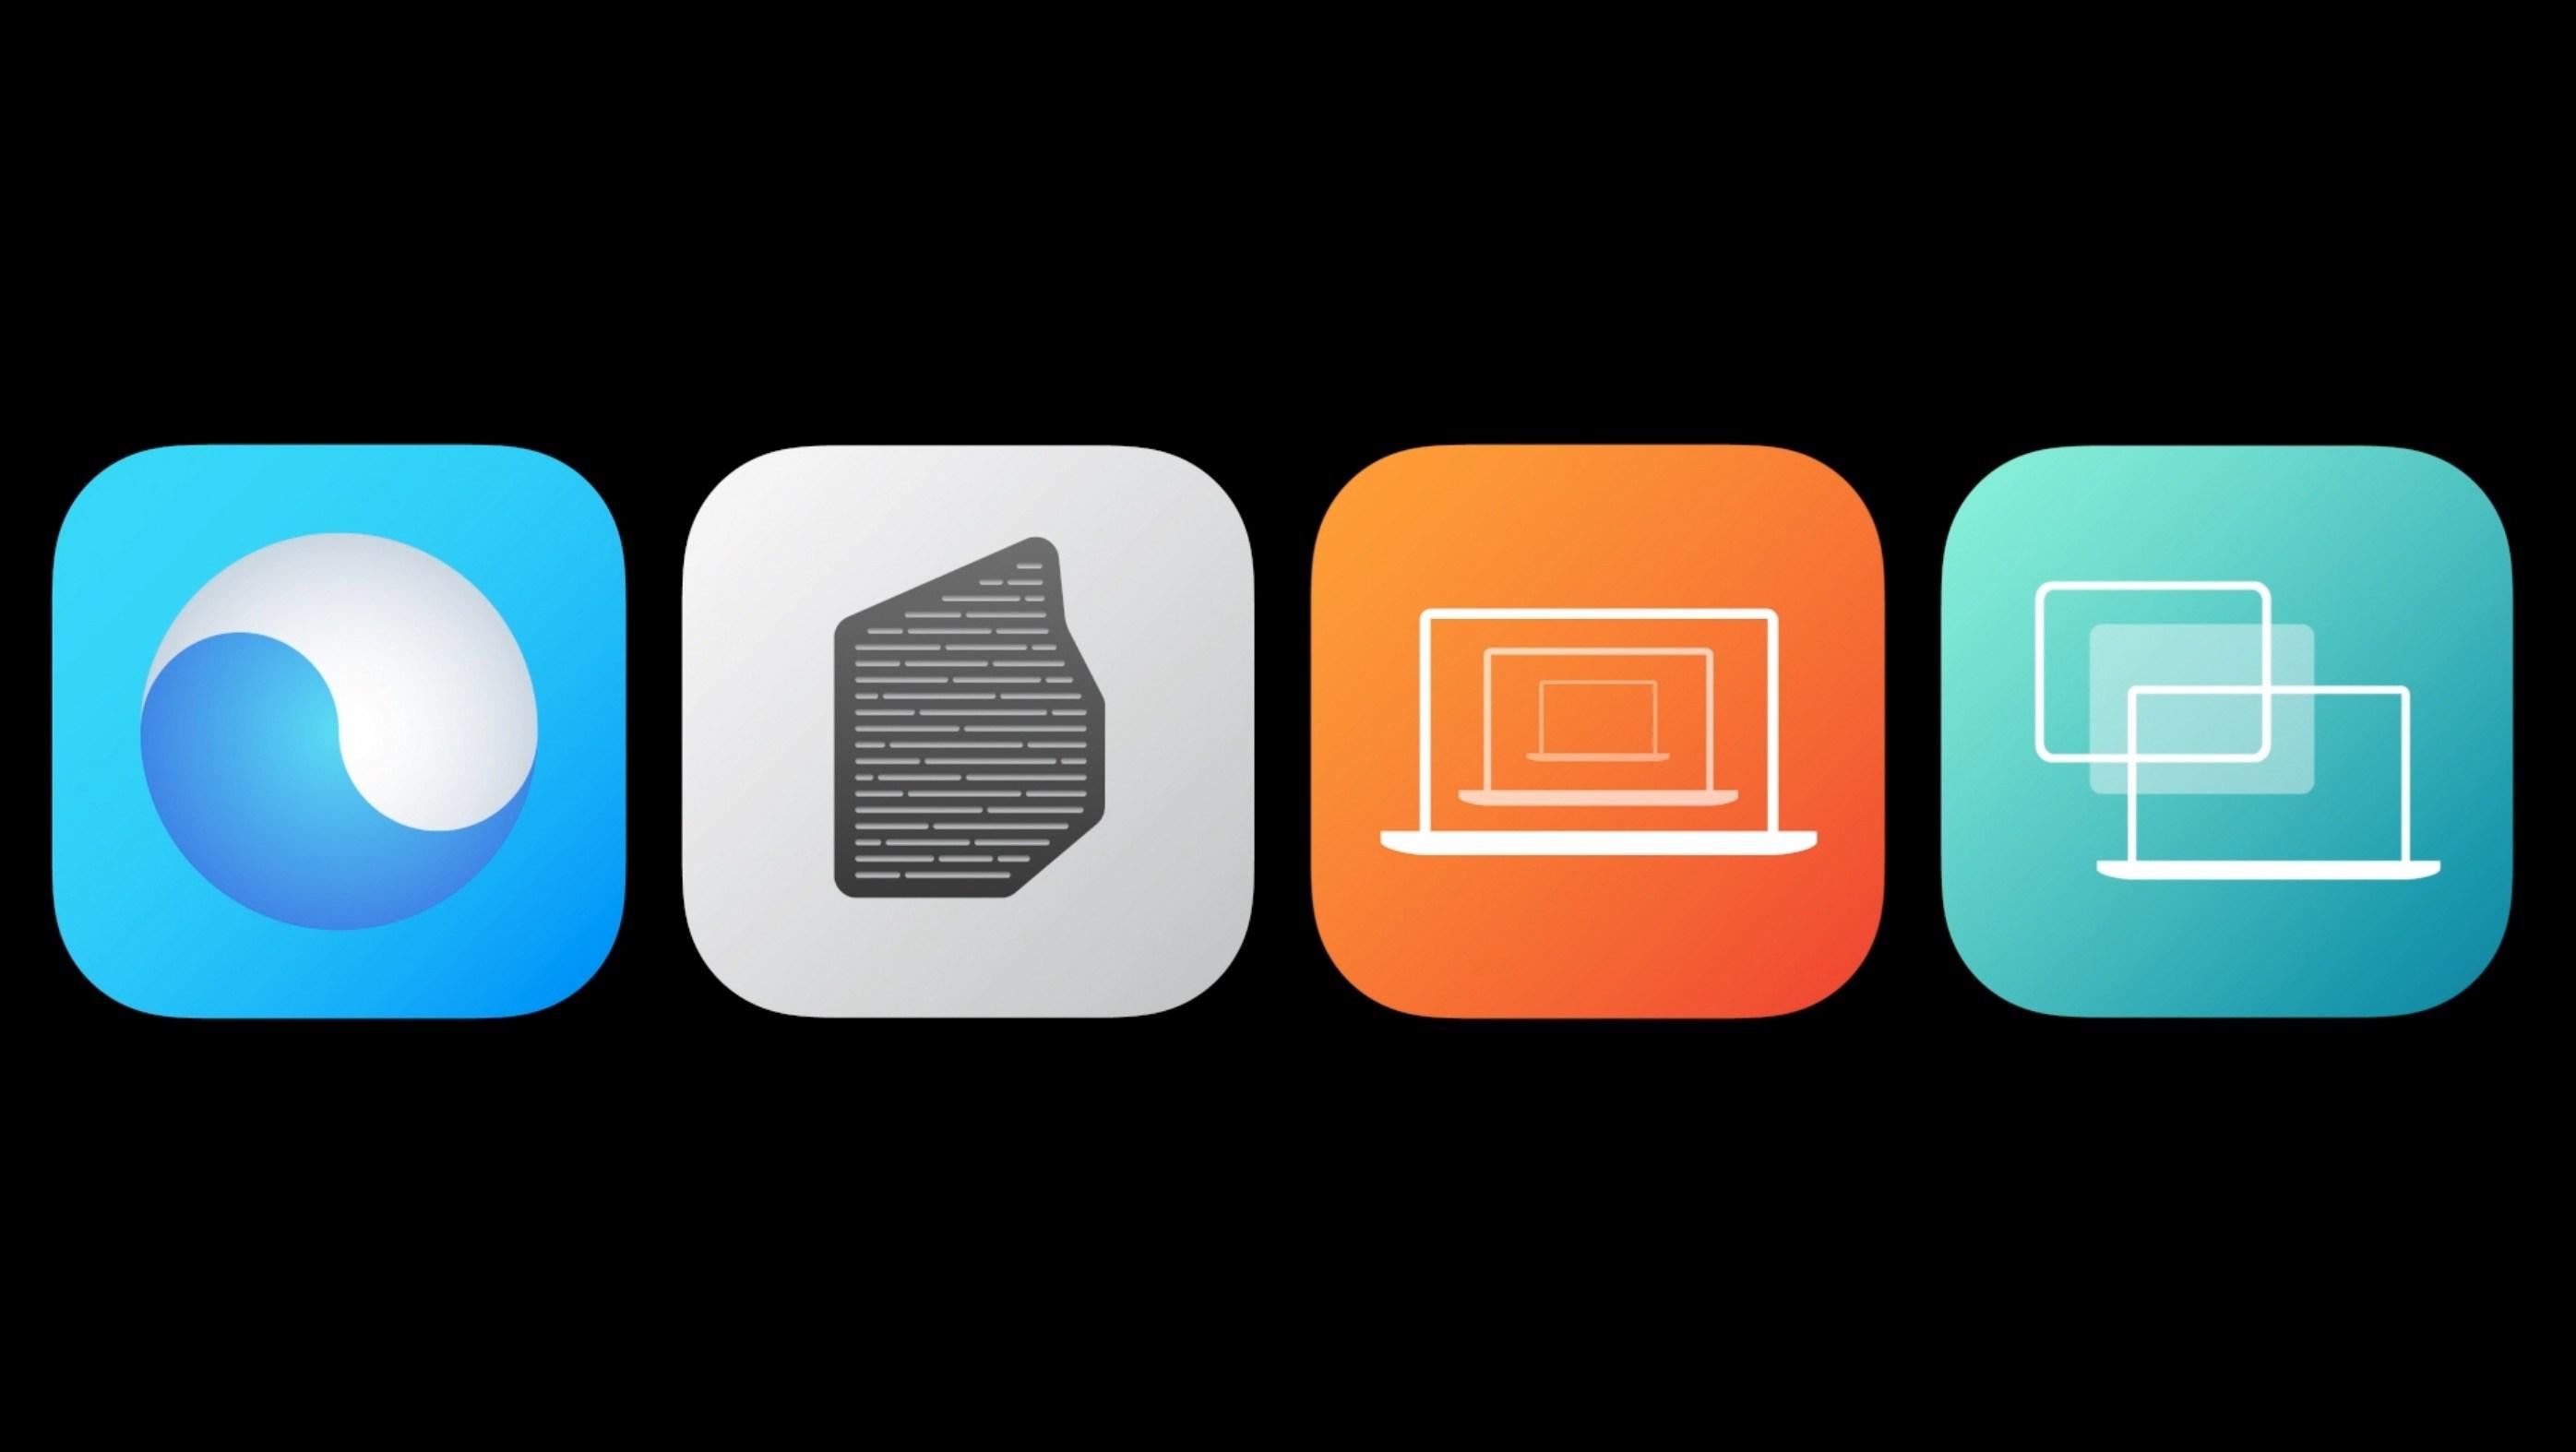 Apple có thể vô hiệu hóa Rosetta 2 trên M1 Mac